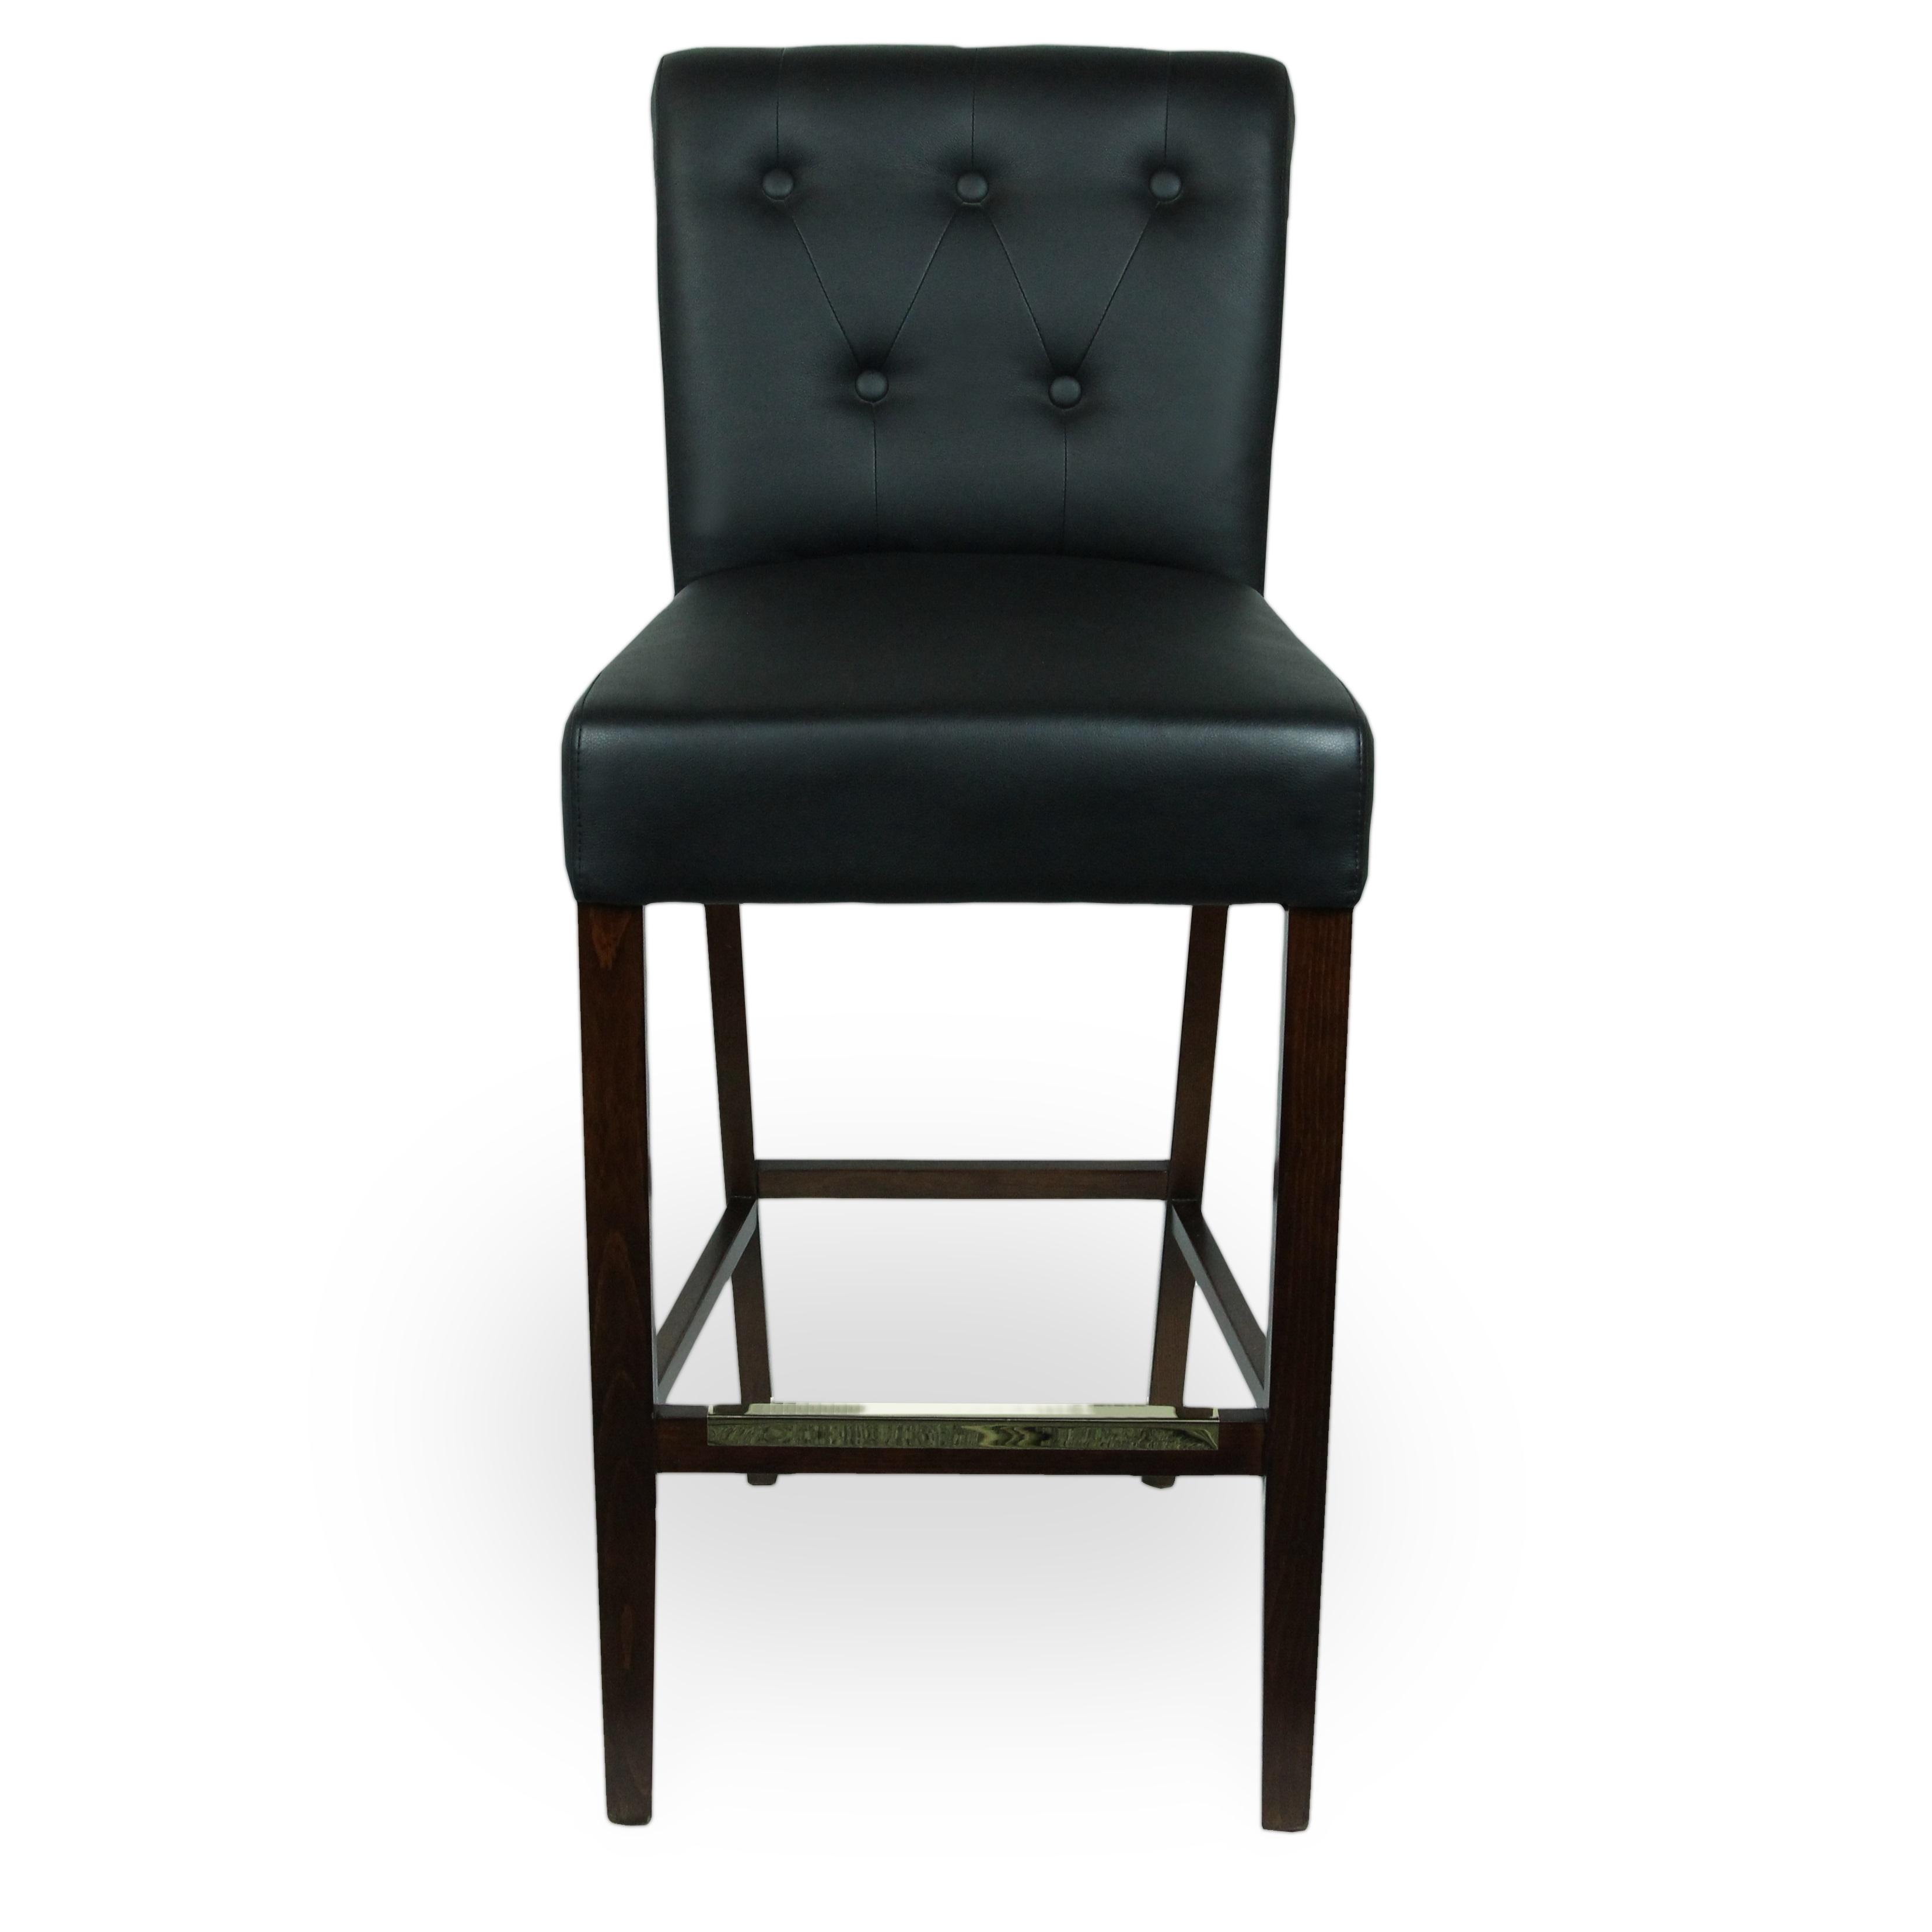 Wood Upholstered Pullover Rolled & Tufted Back Barstool